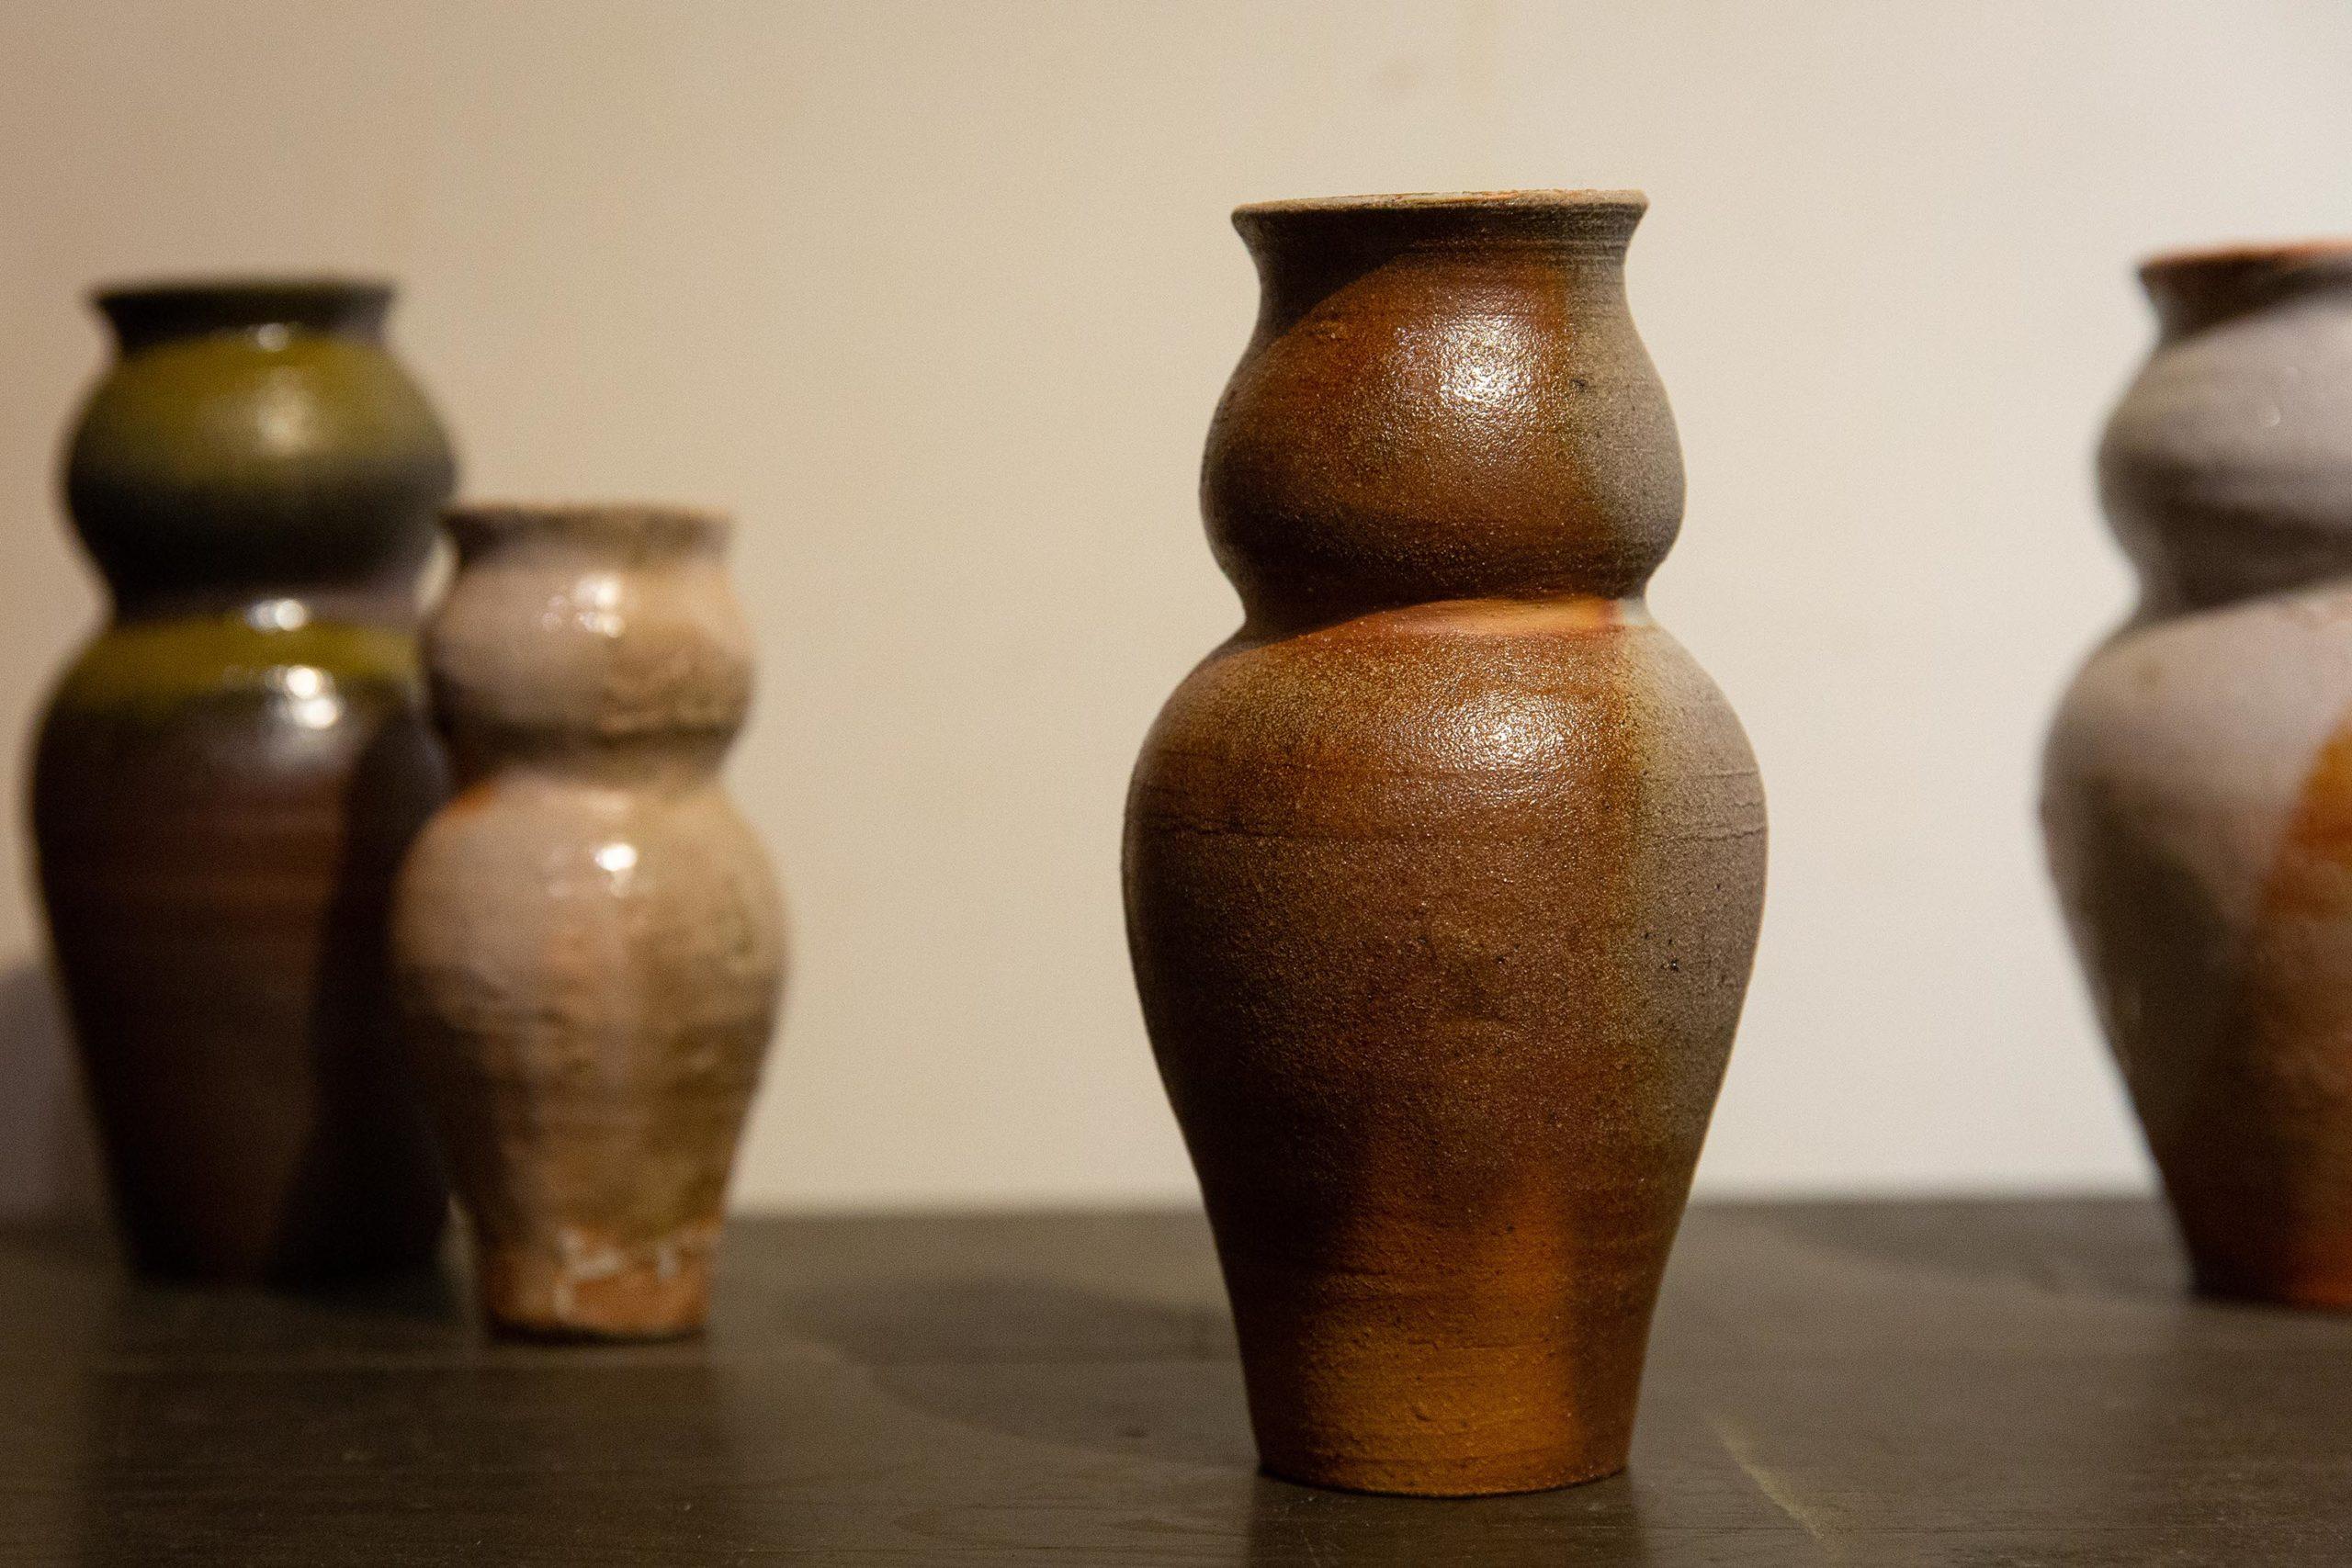 Georgie Proud ceramic art installation Shiro Oni Studio Japan